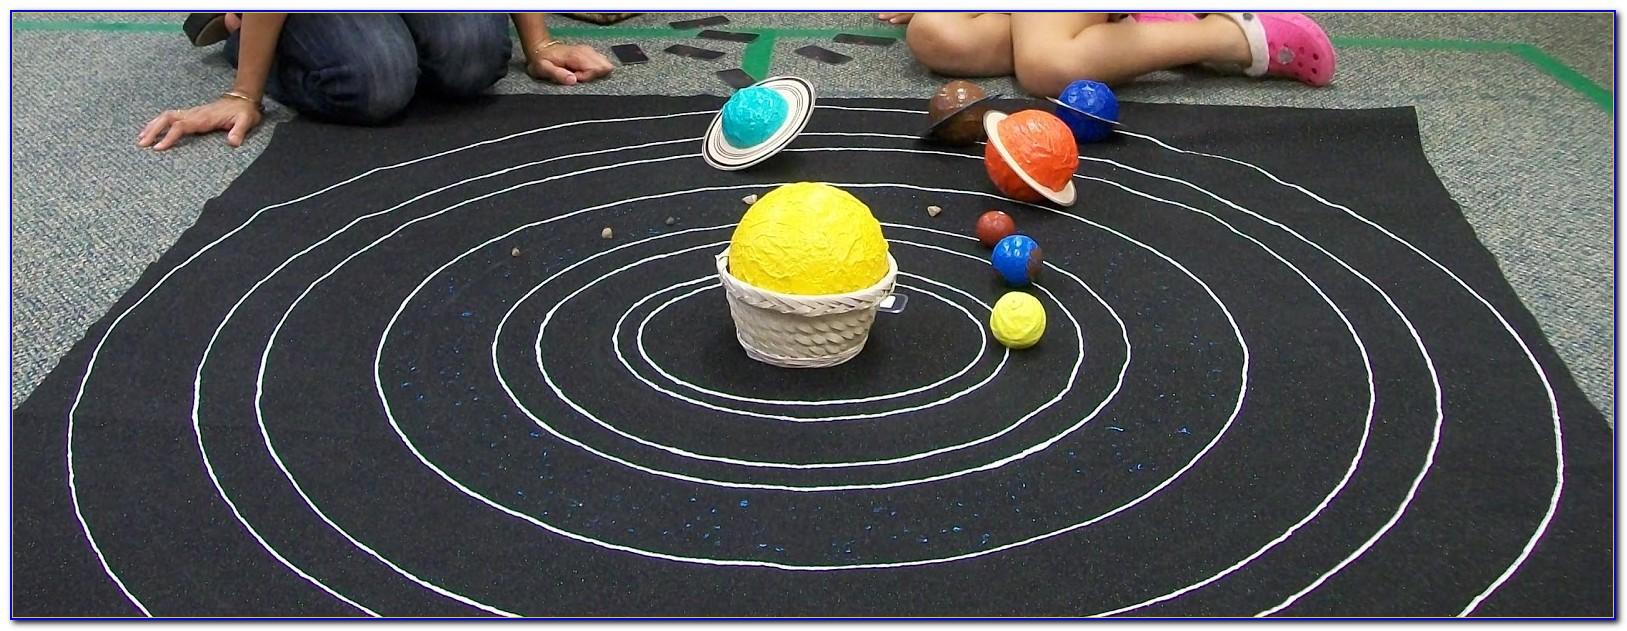 Solar System Floor Rug